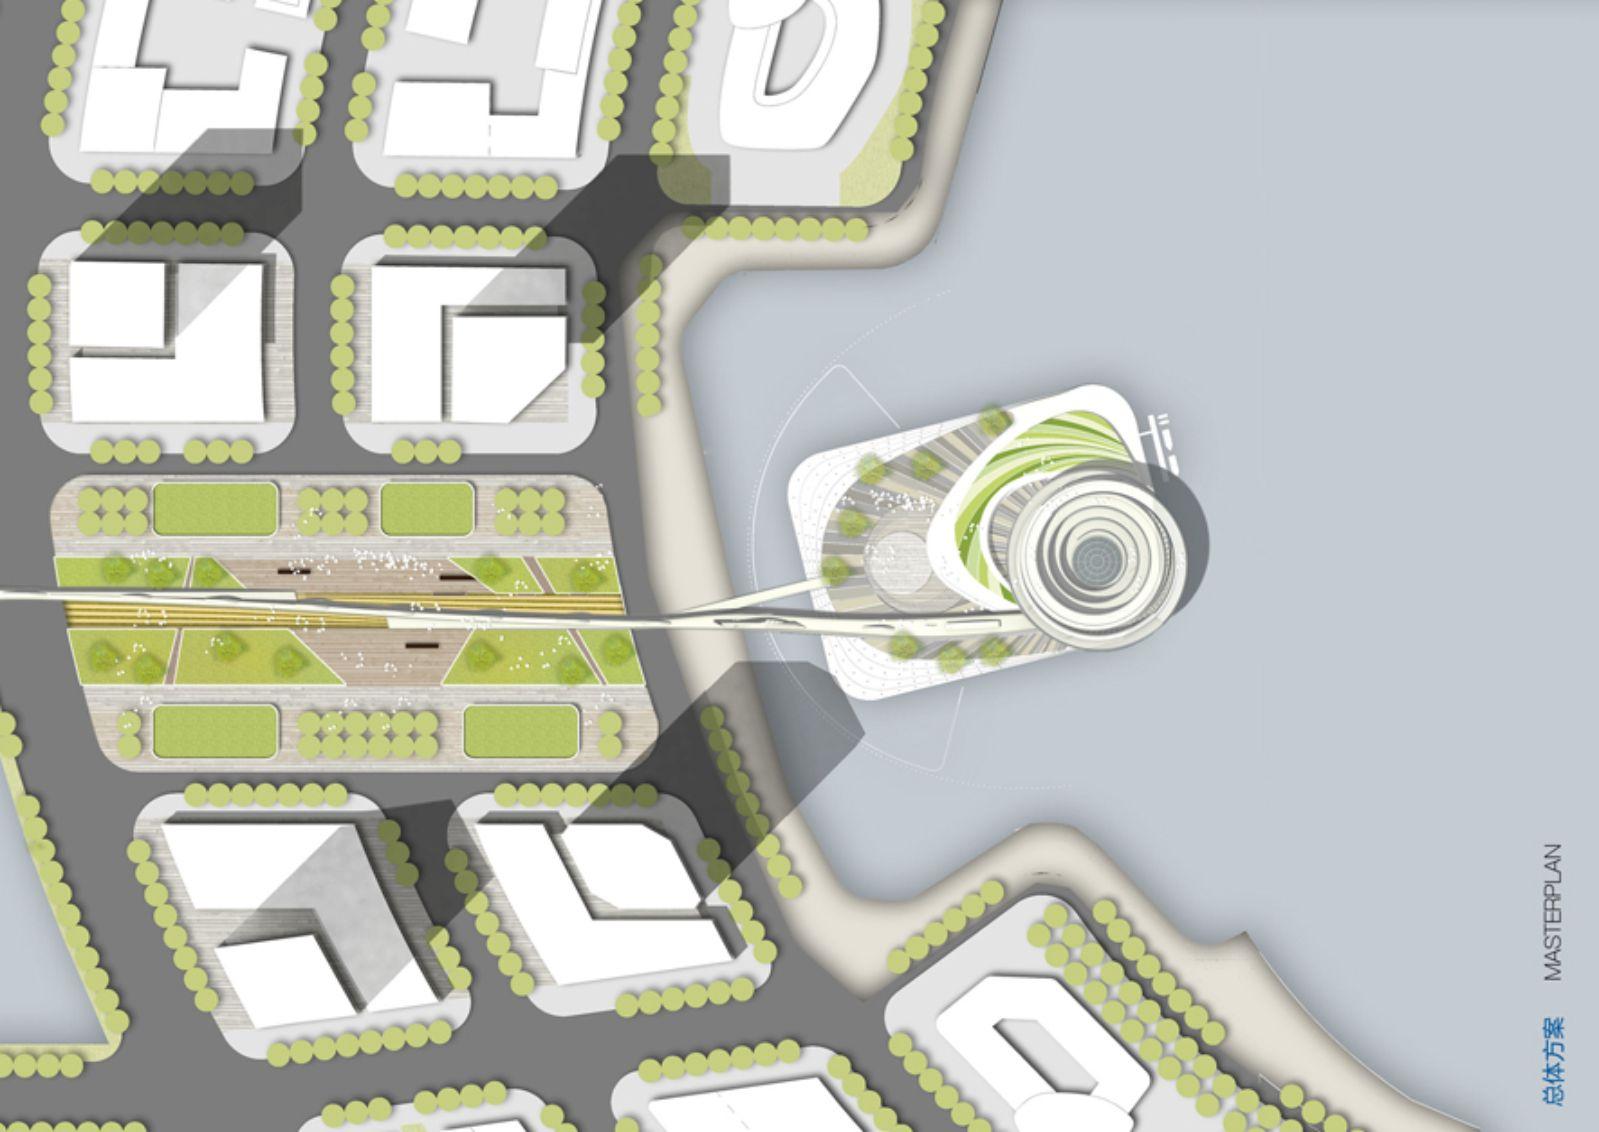 10-KSP-wins-the-Meixi-Urban-Helix-competition